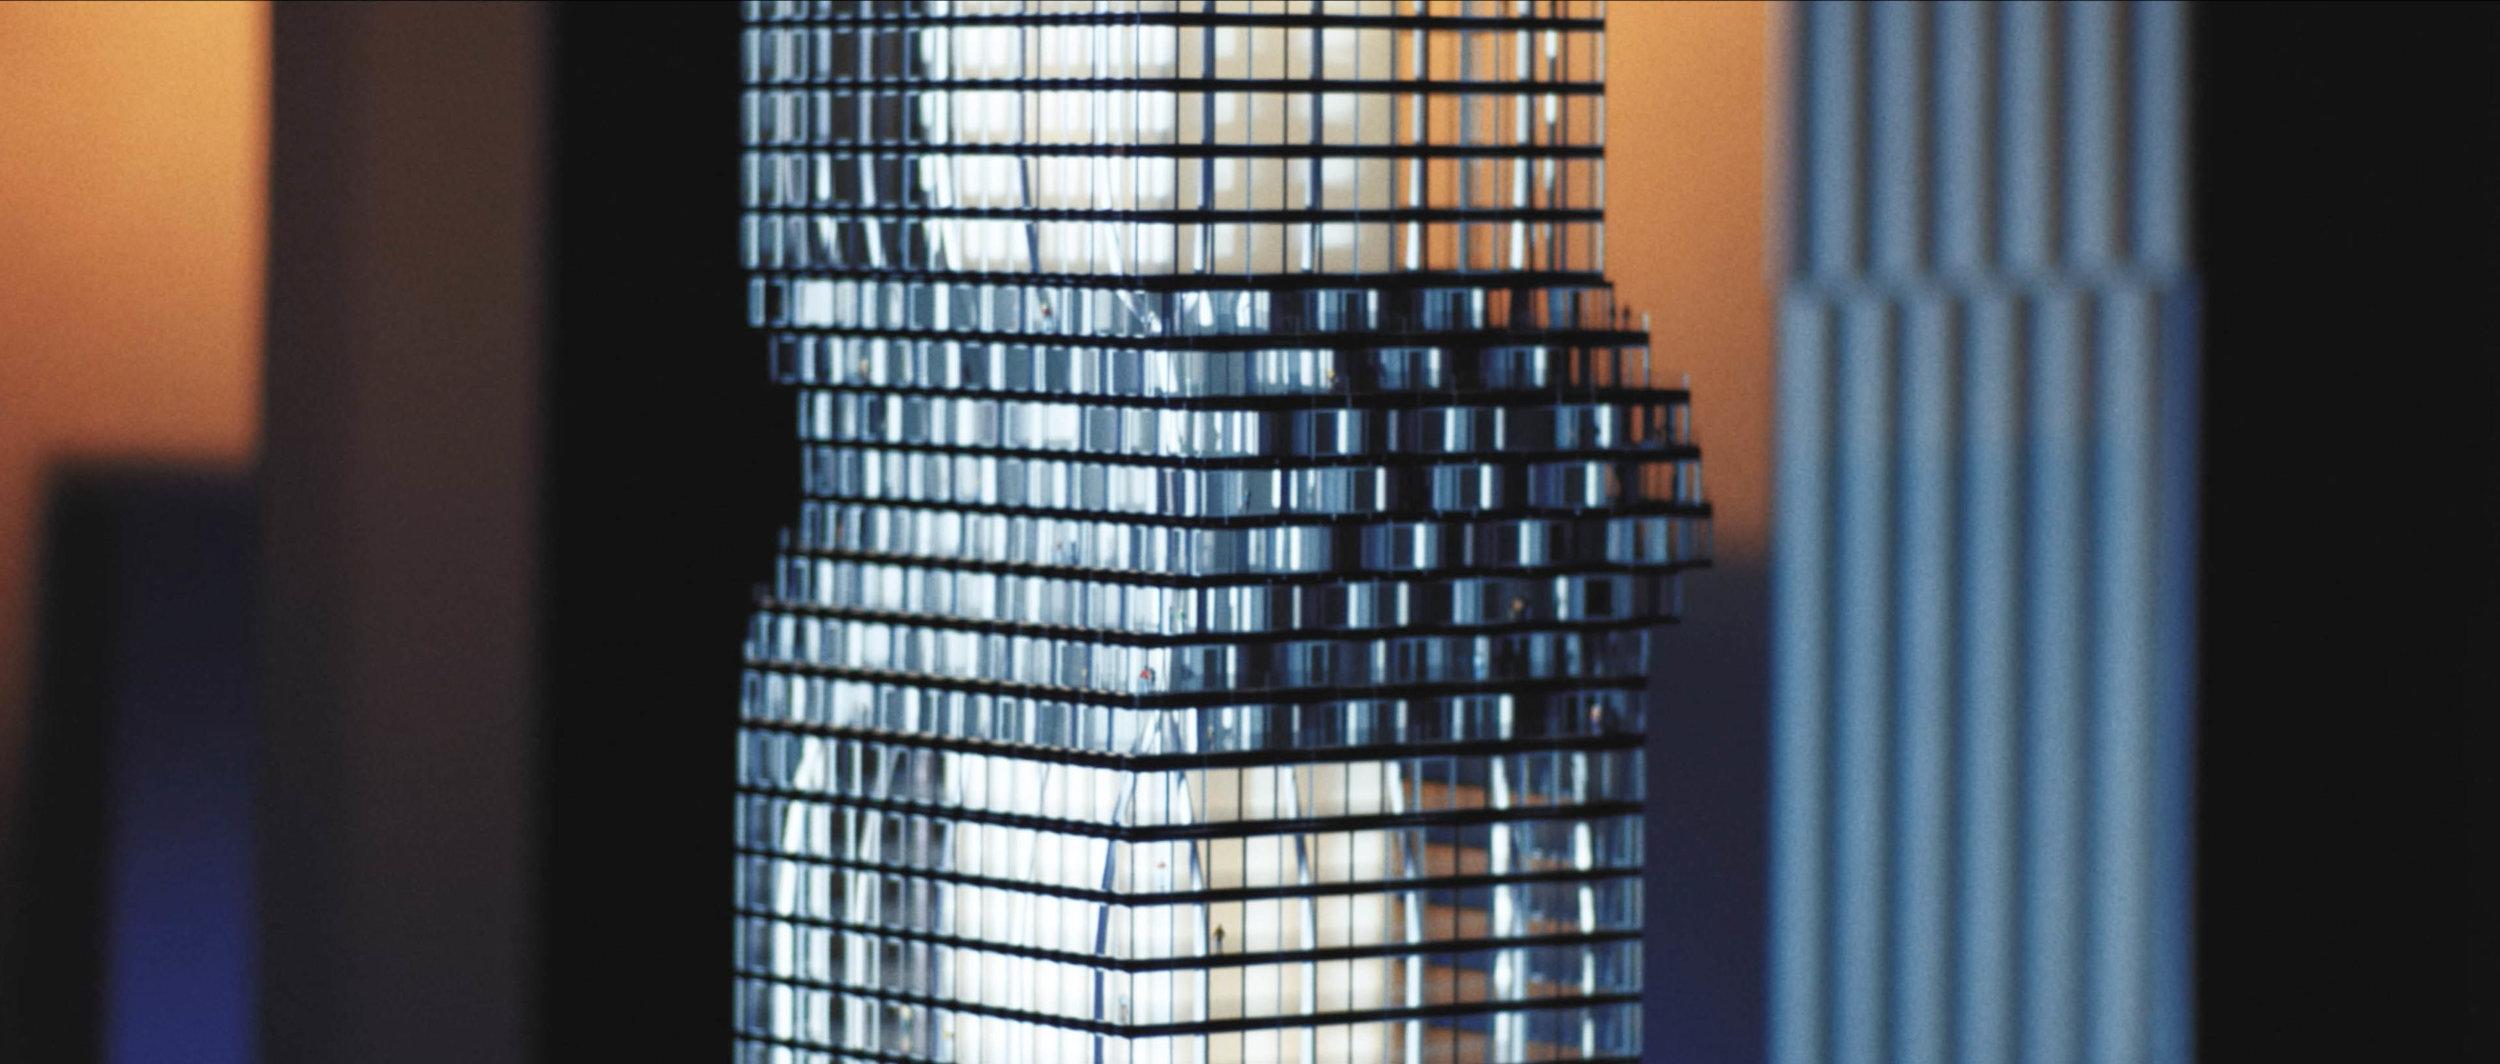 Omniturm-Frankfurt-Tishman-Speyer-Architecture-Idea-Art-City_04.jpg